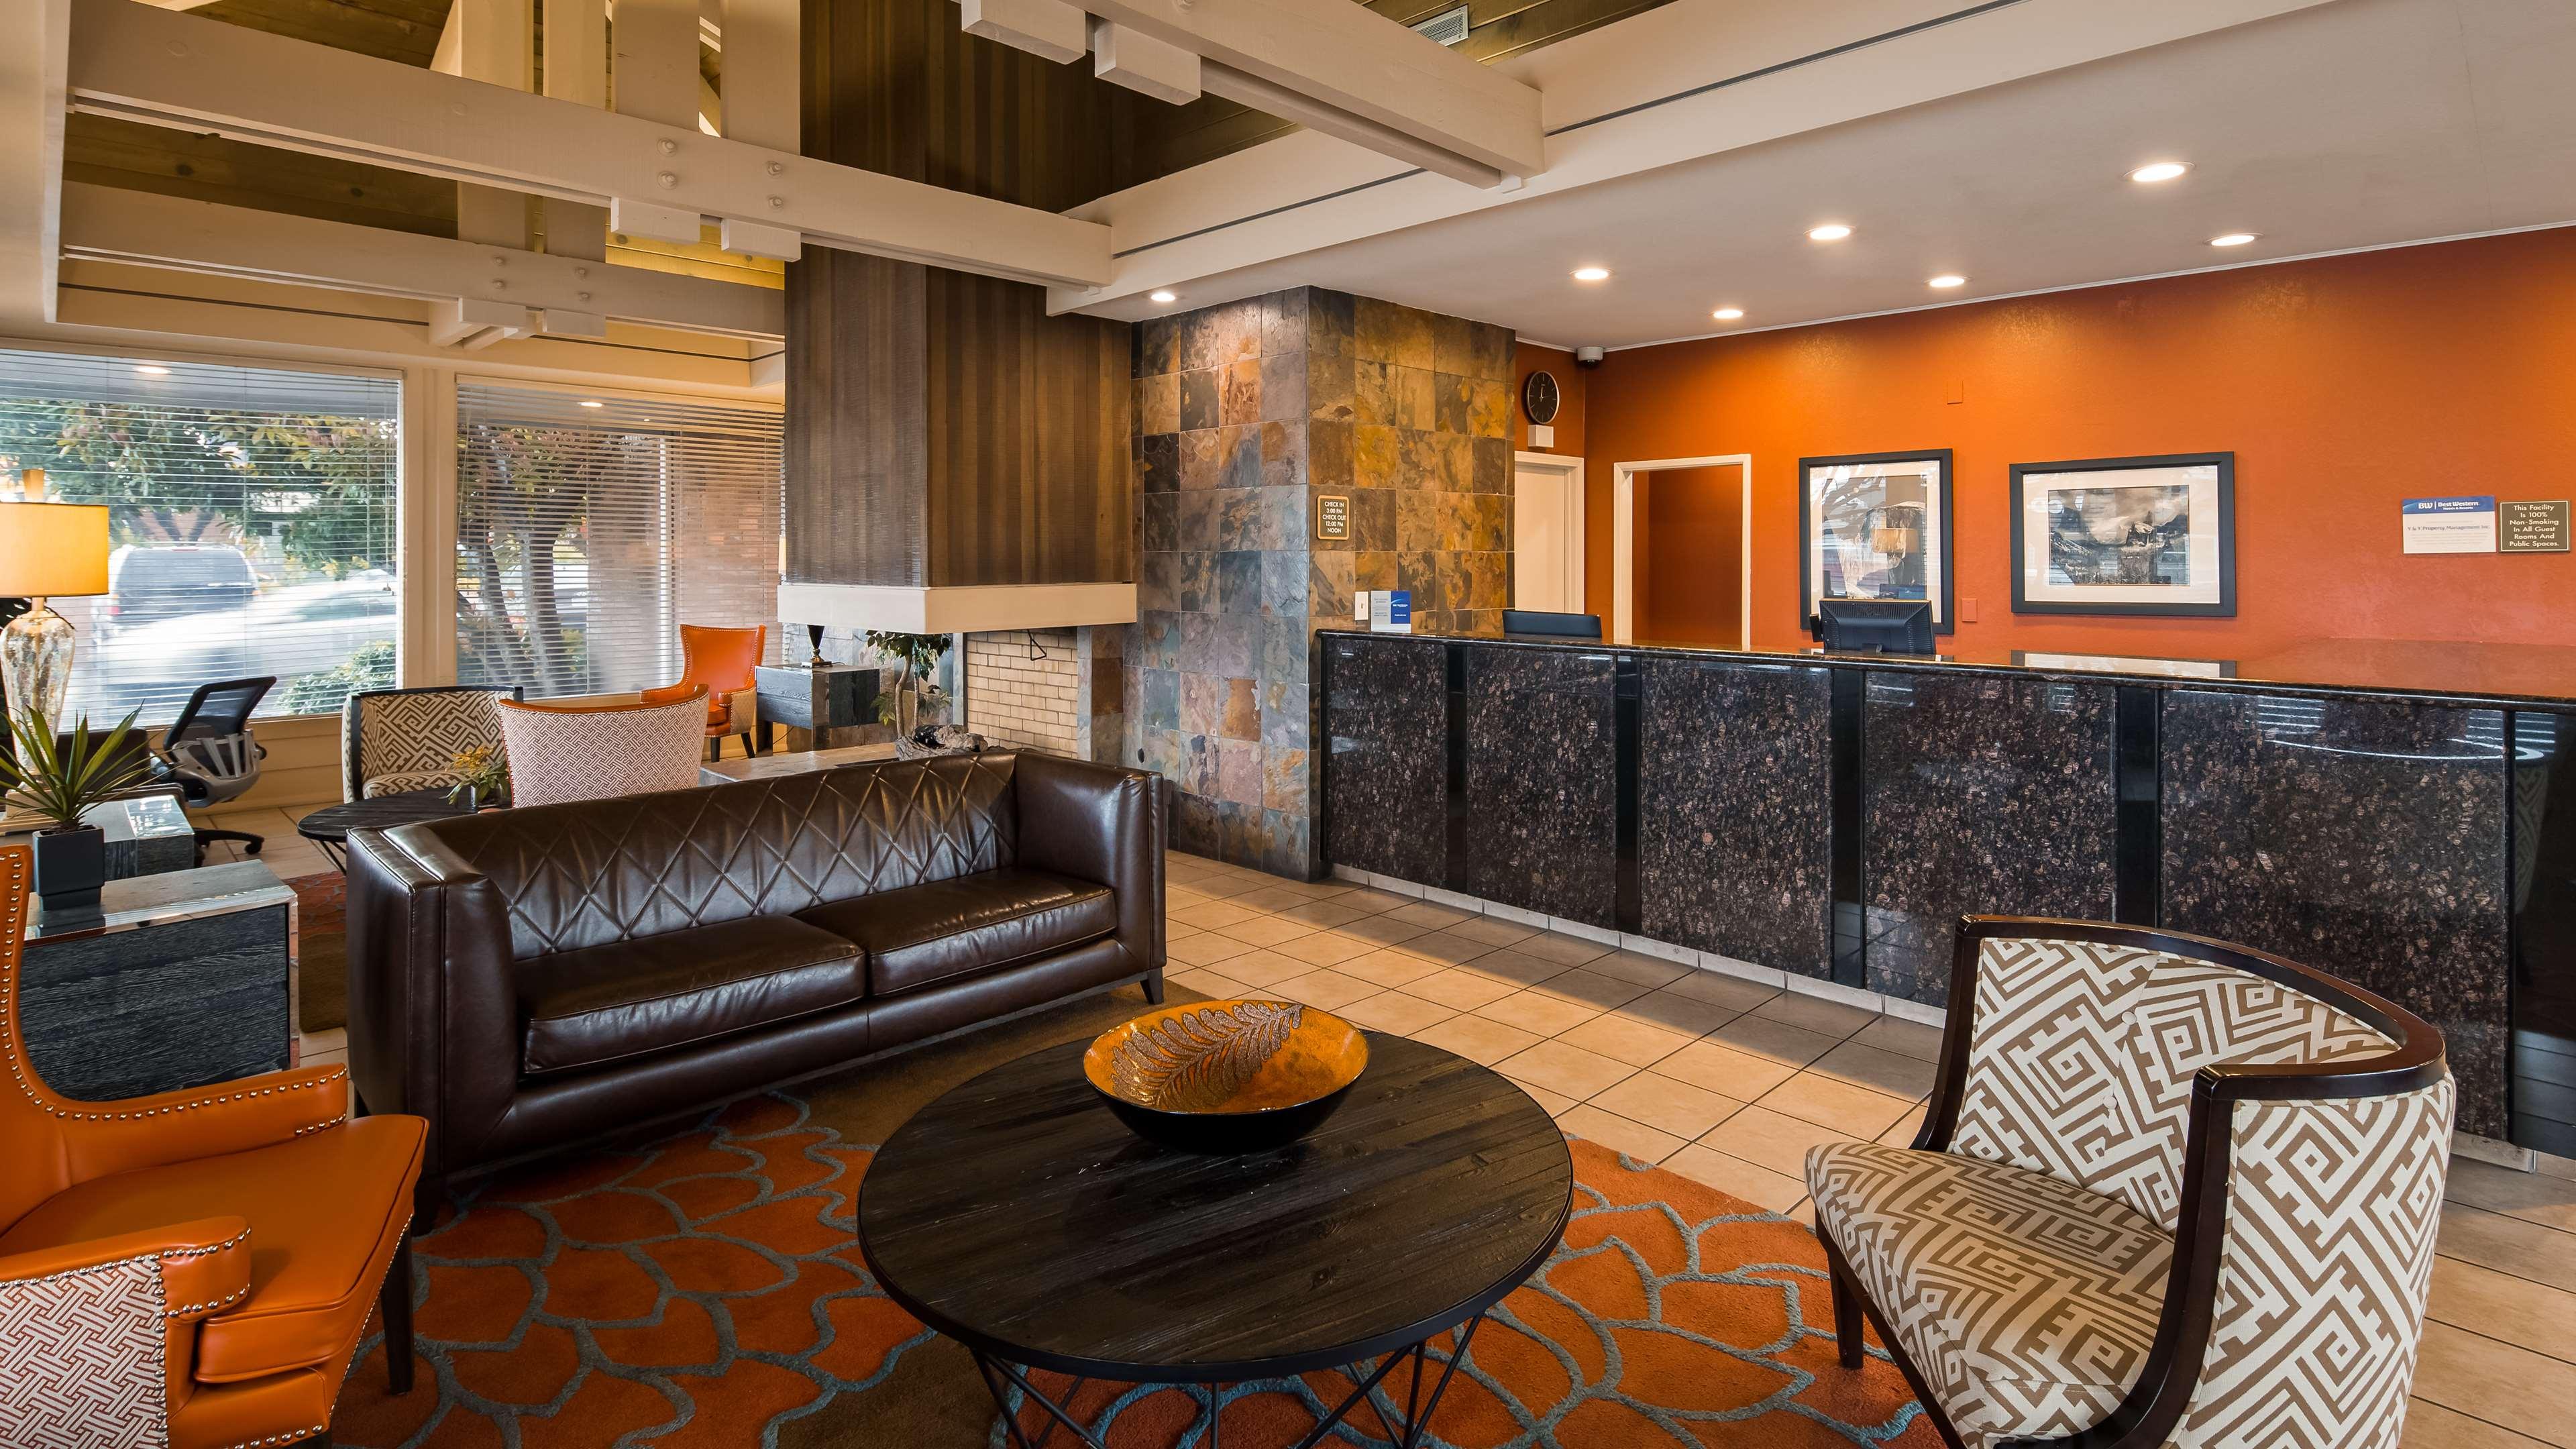 Best Chinese Restaurant In Fresno Ca